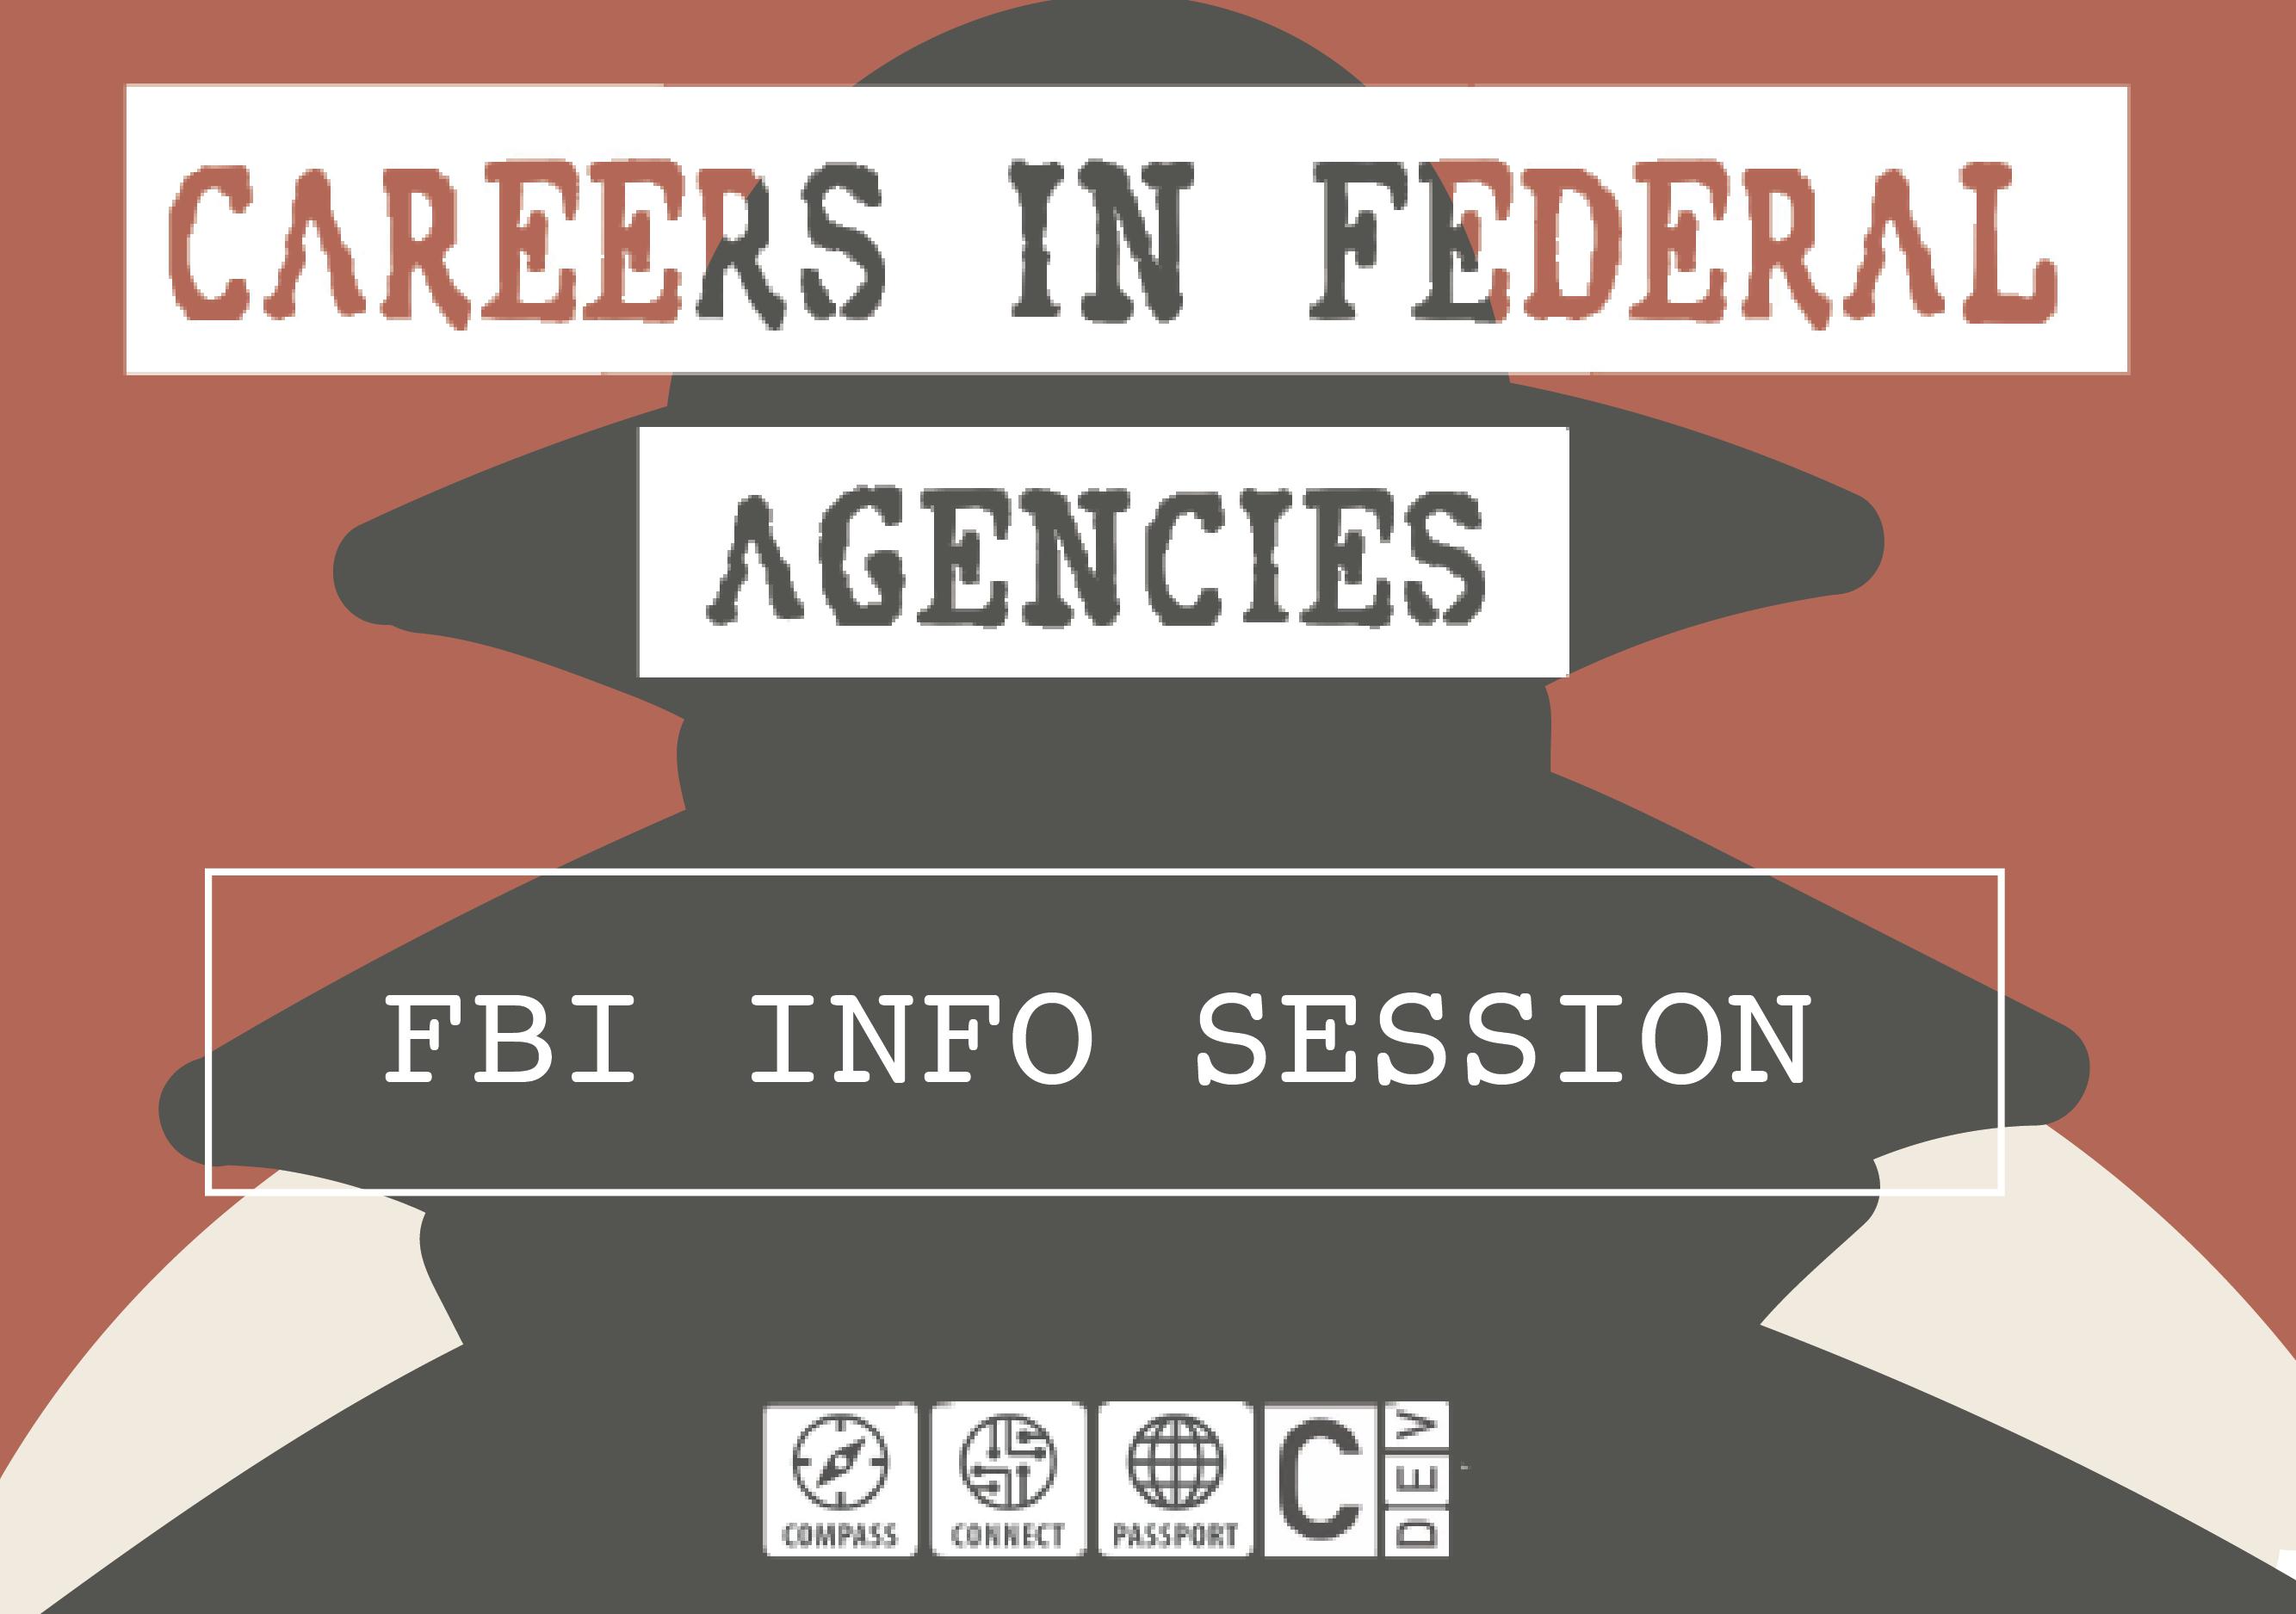 FBI Info Session Event Flyer